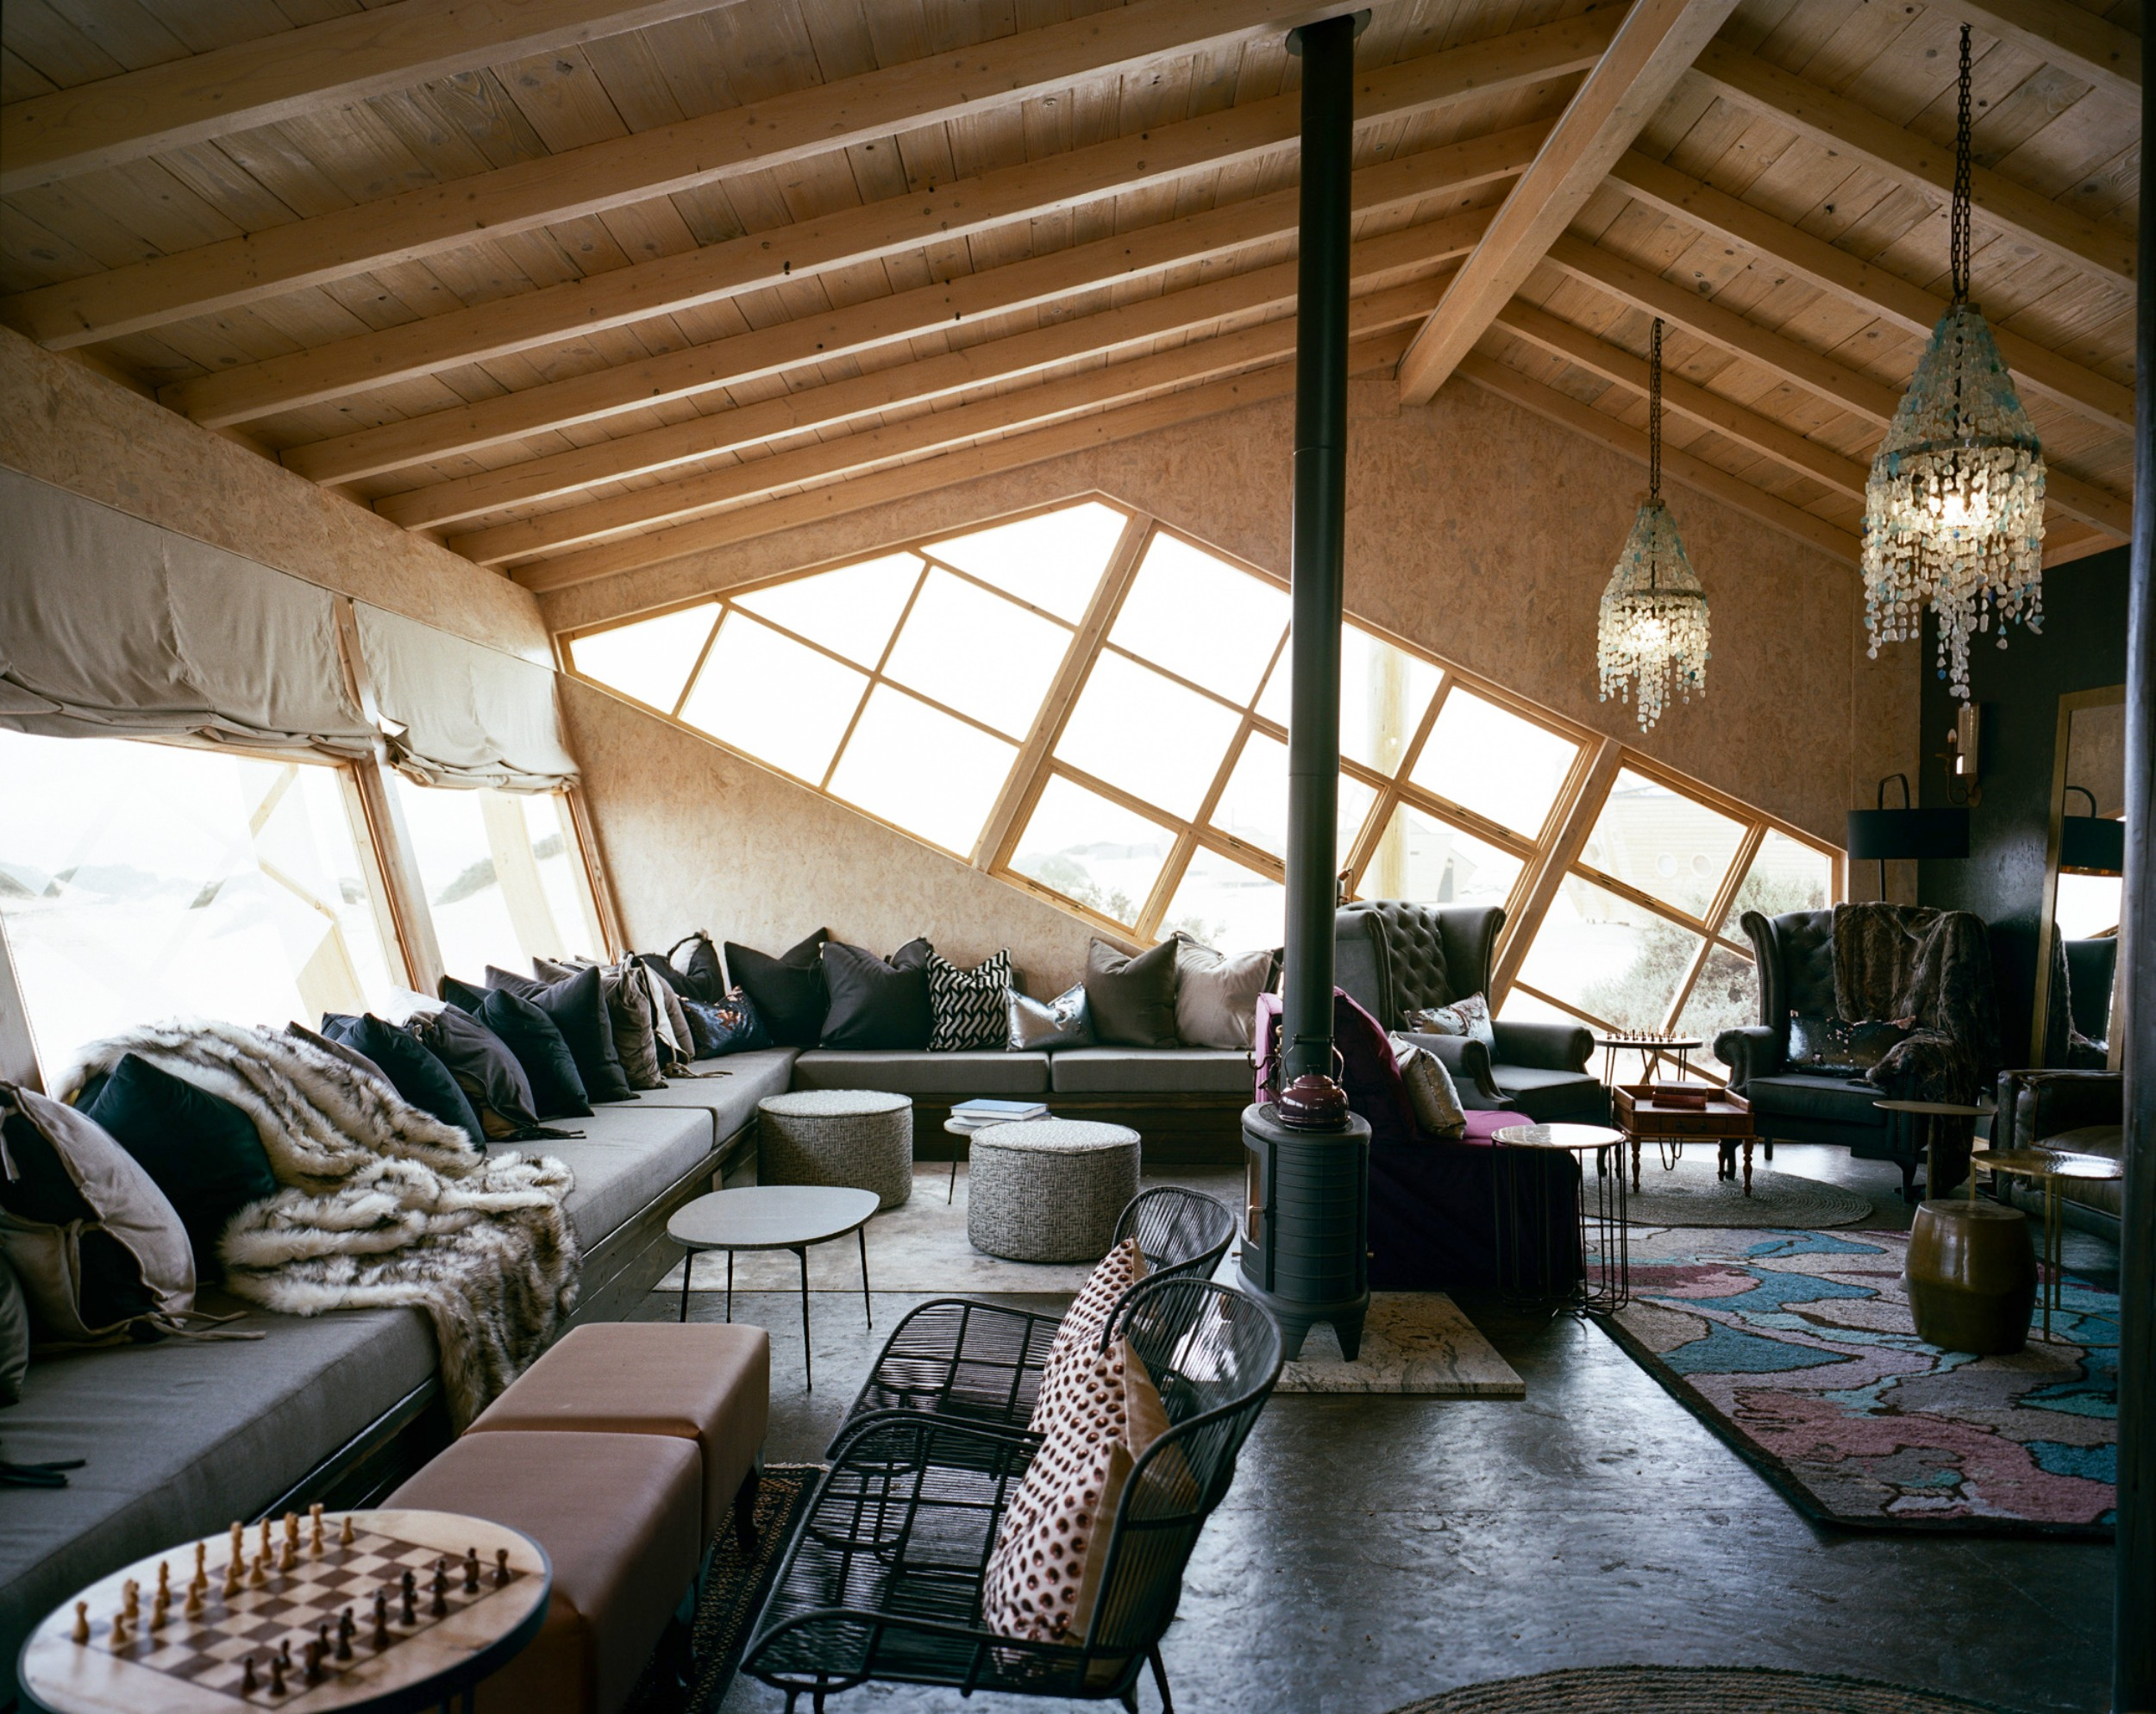 13Shipwreck Lodge - Main area1.jpg